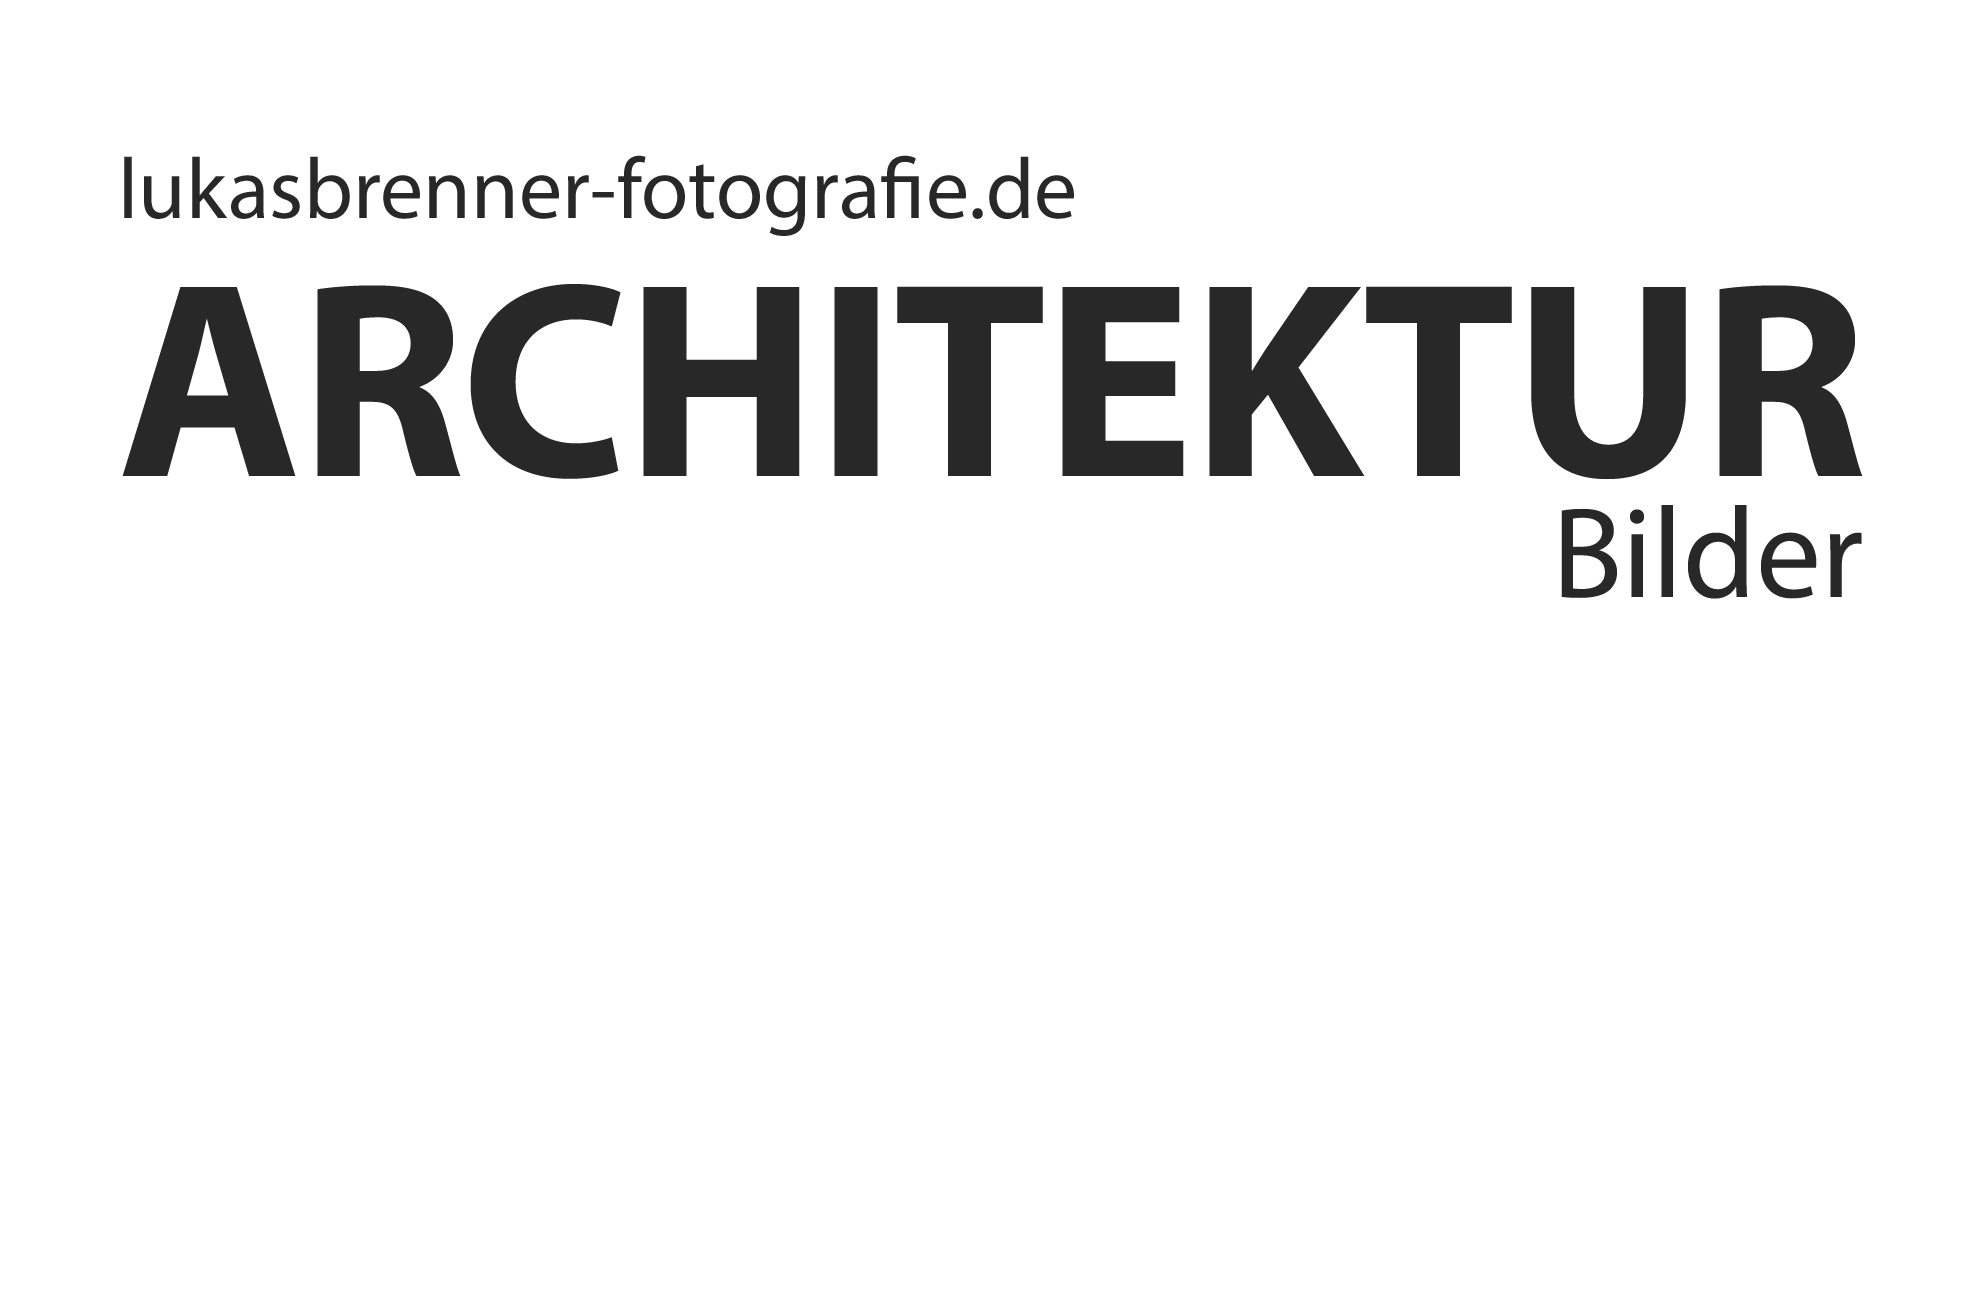 Lukas Brenner Architekturfotografie Stuttgart